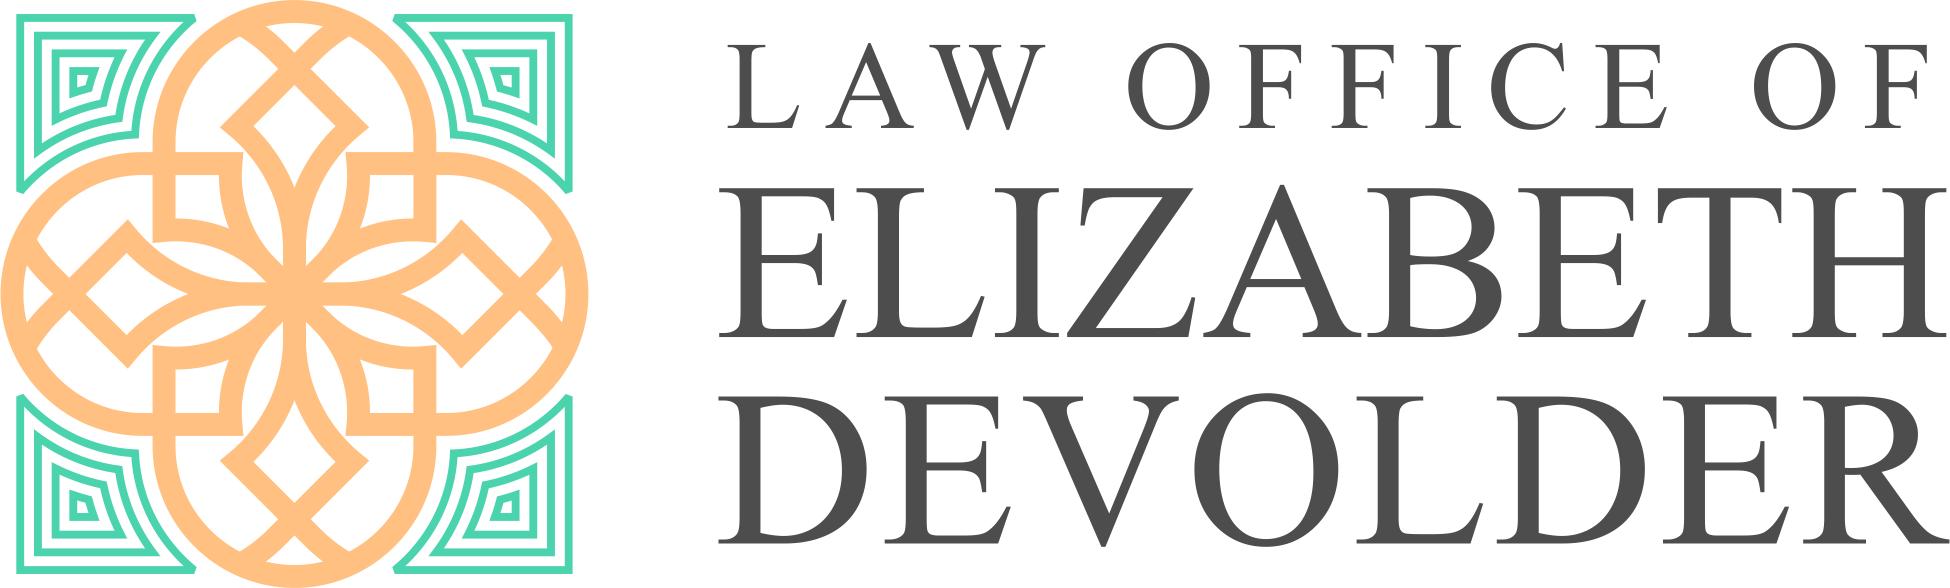 Law Office of Elizabeth Devolder